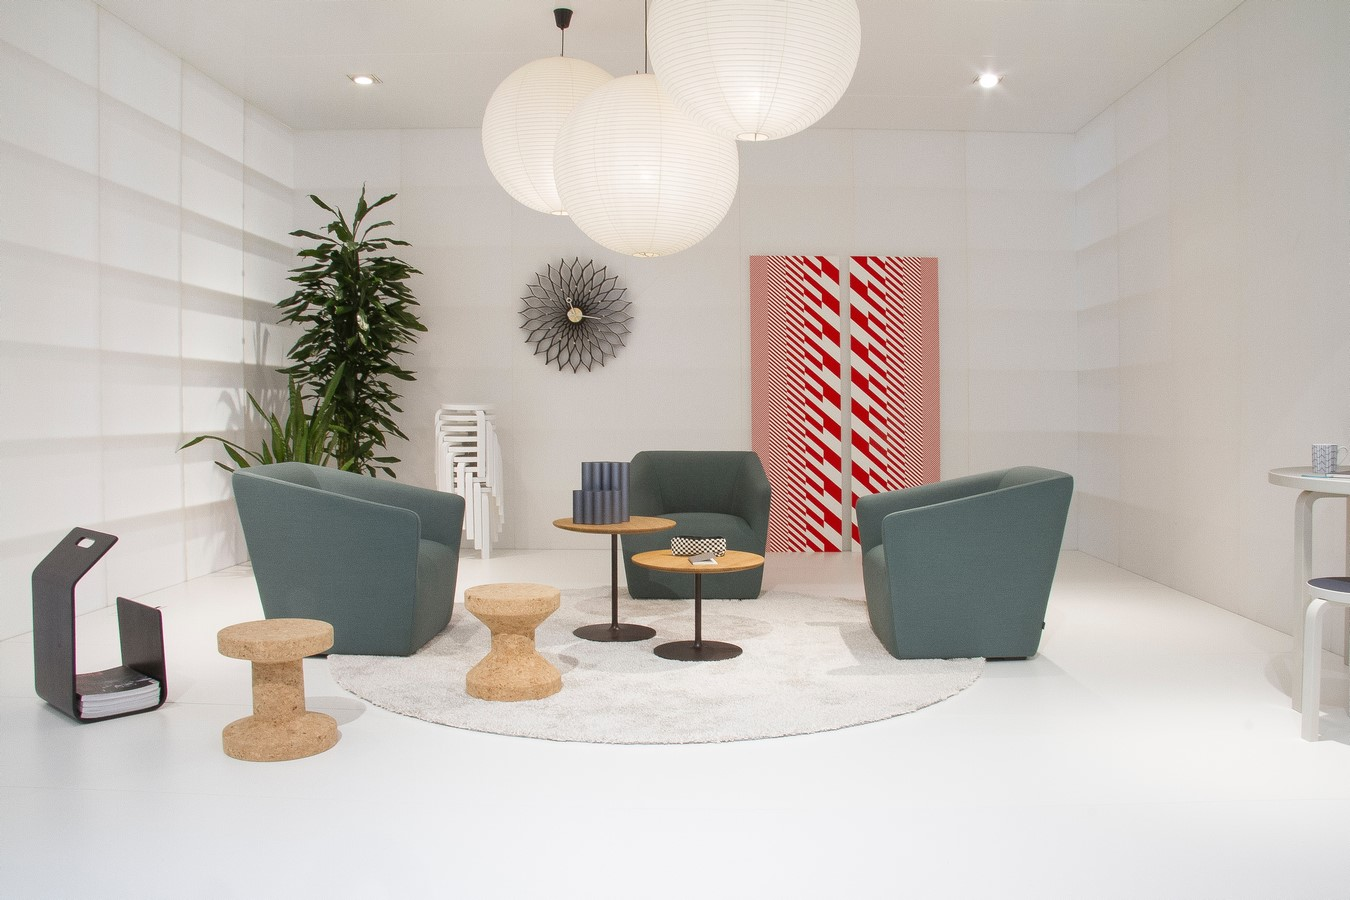 List of Interior Design awards - Sheet7